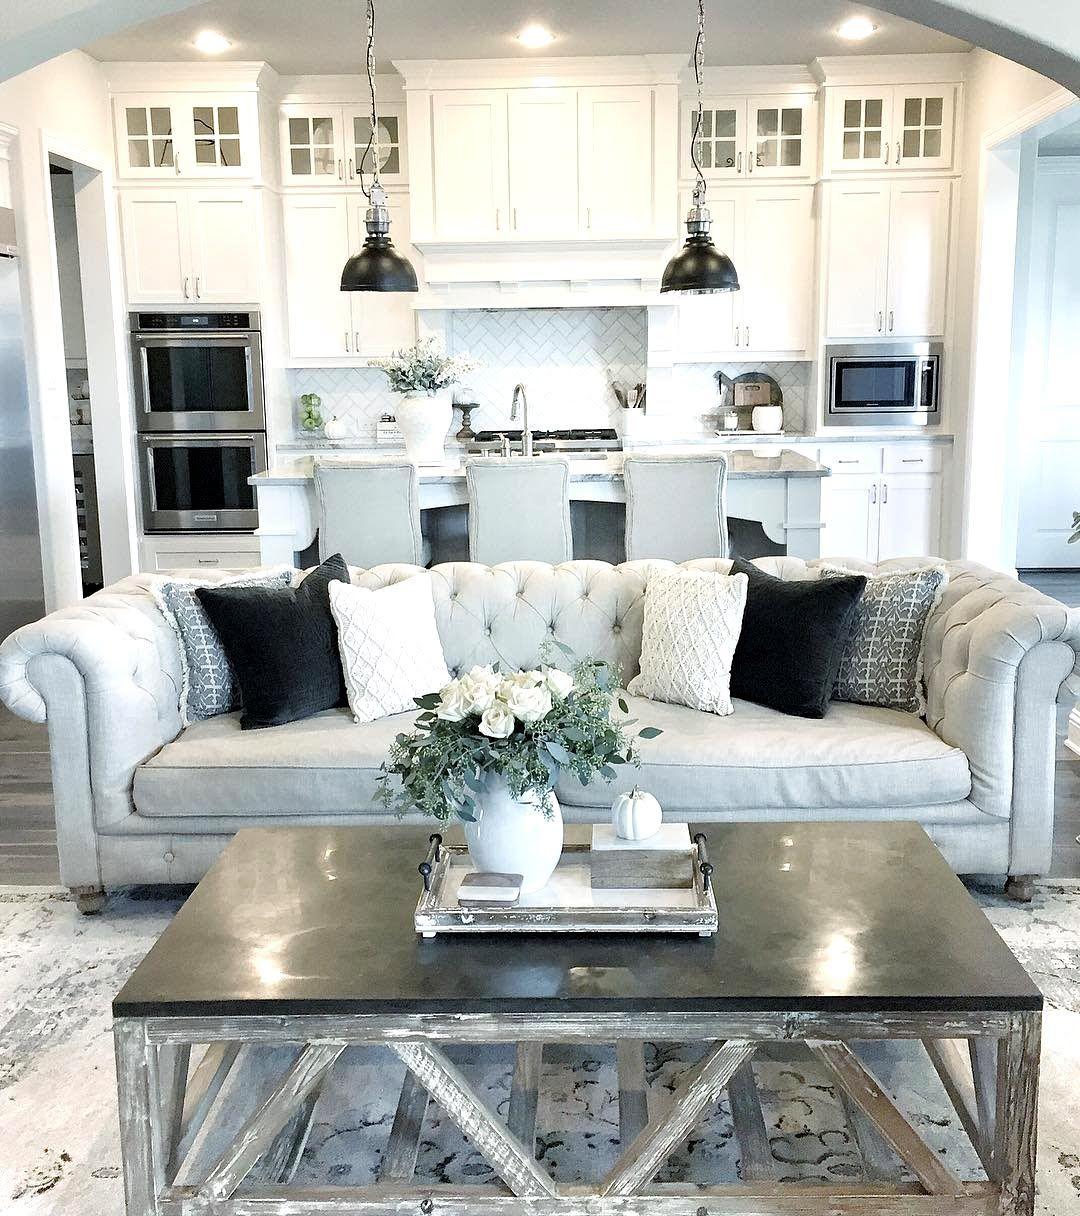 top living room interior design tips | ana arredondo by design-home